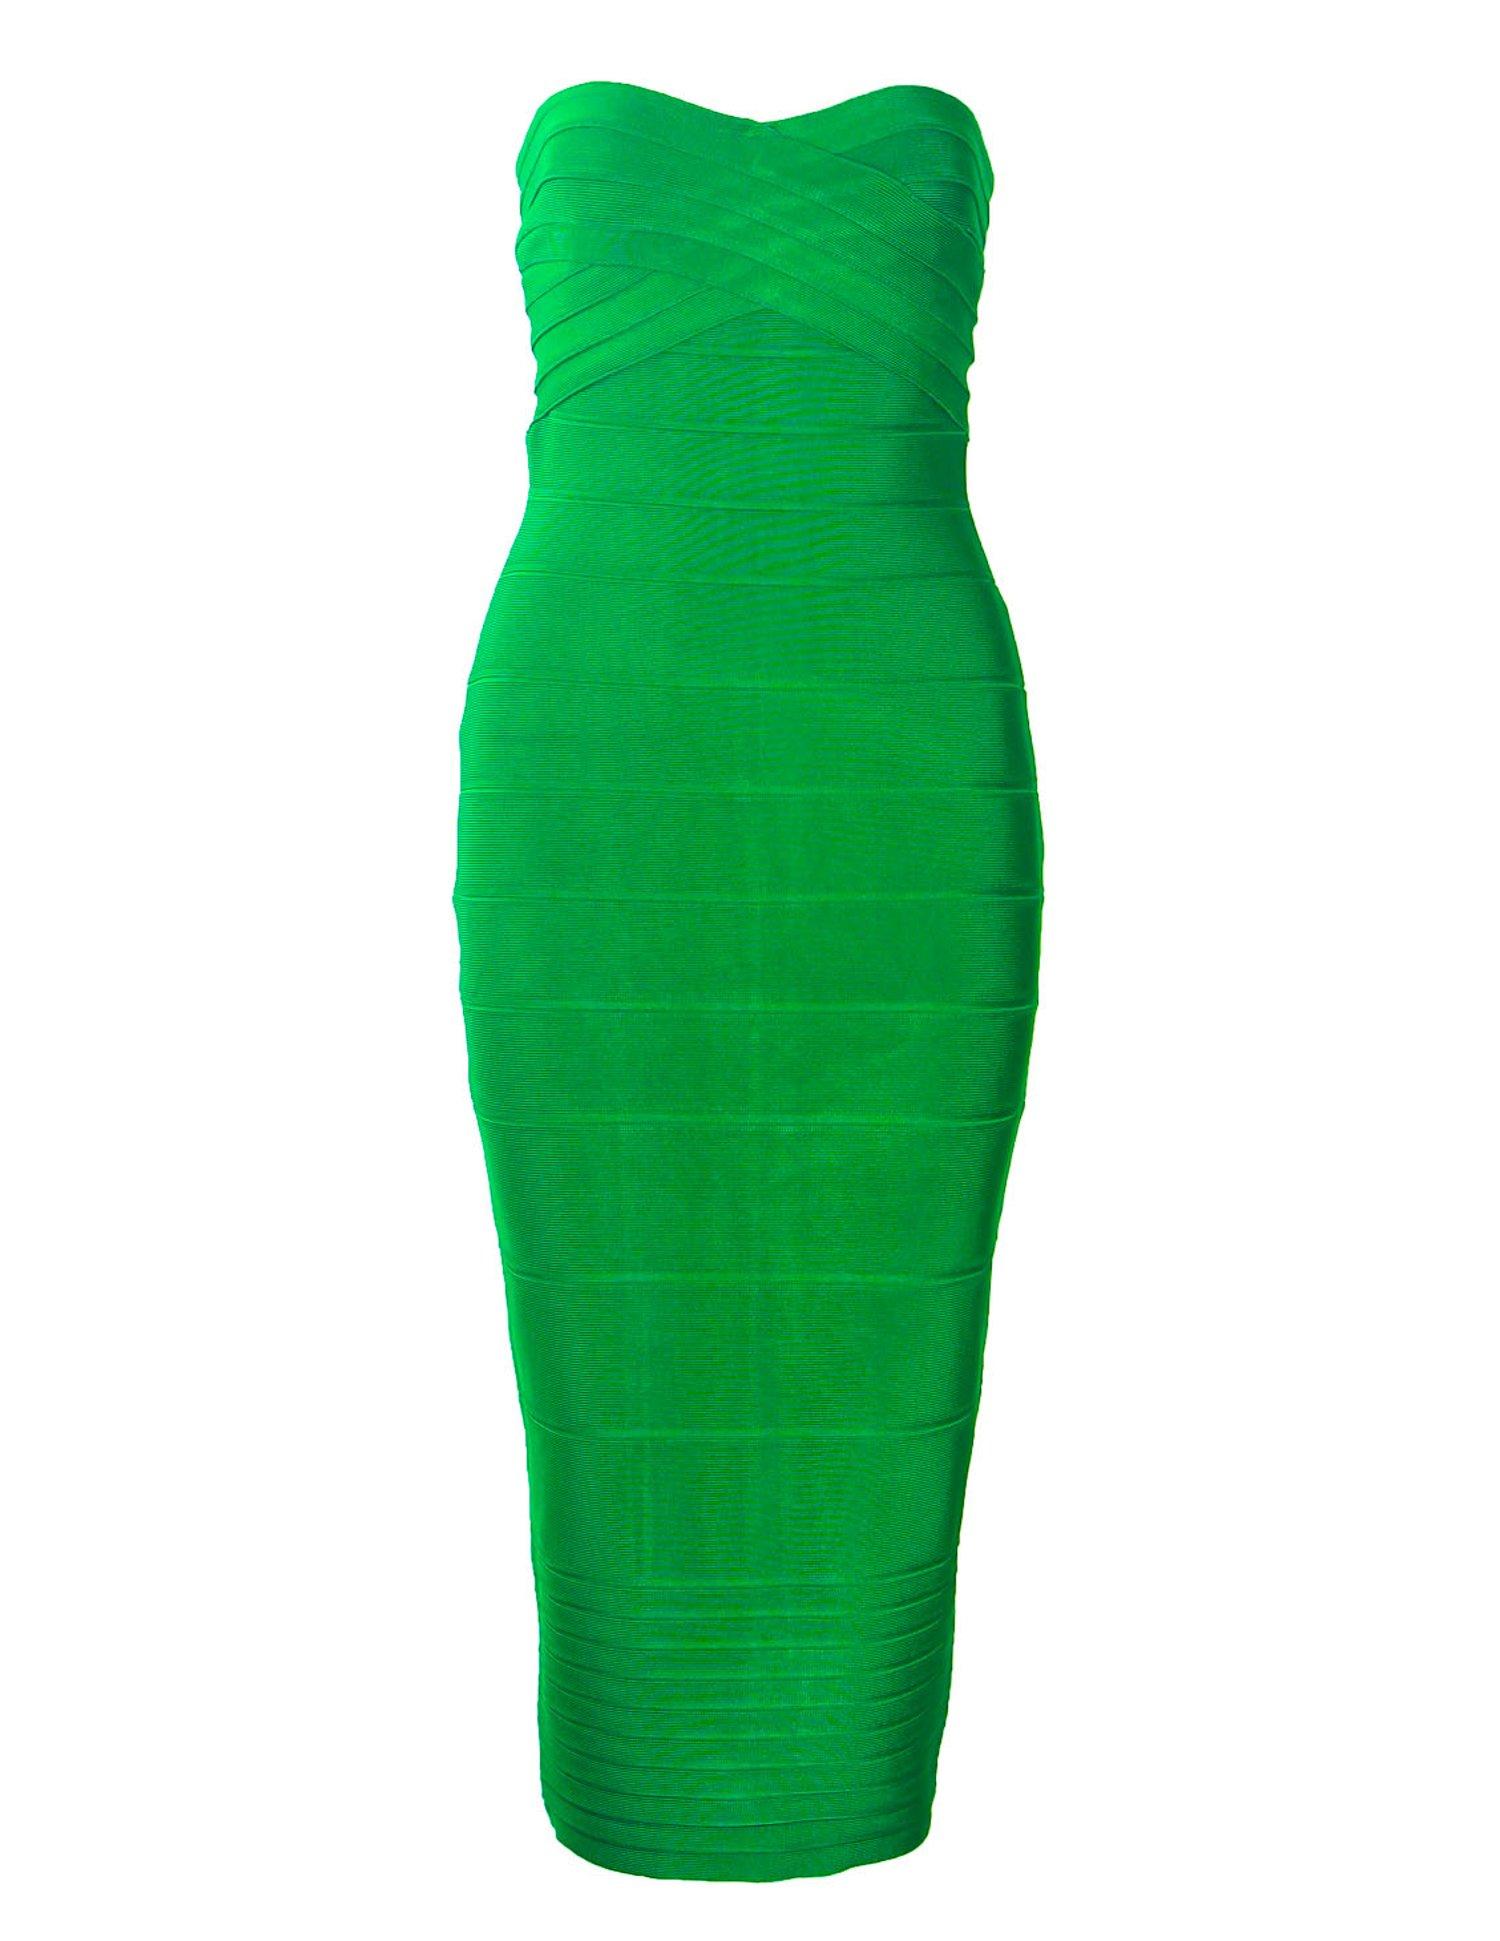 4c9230252 ... Meilun Women s Knee Strapless Bandage Bodycon Party Dress ‹Return to  Previous Page. Bug Fix. Previous  Next